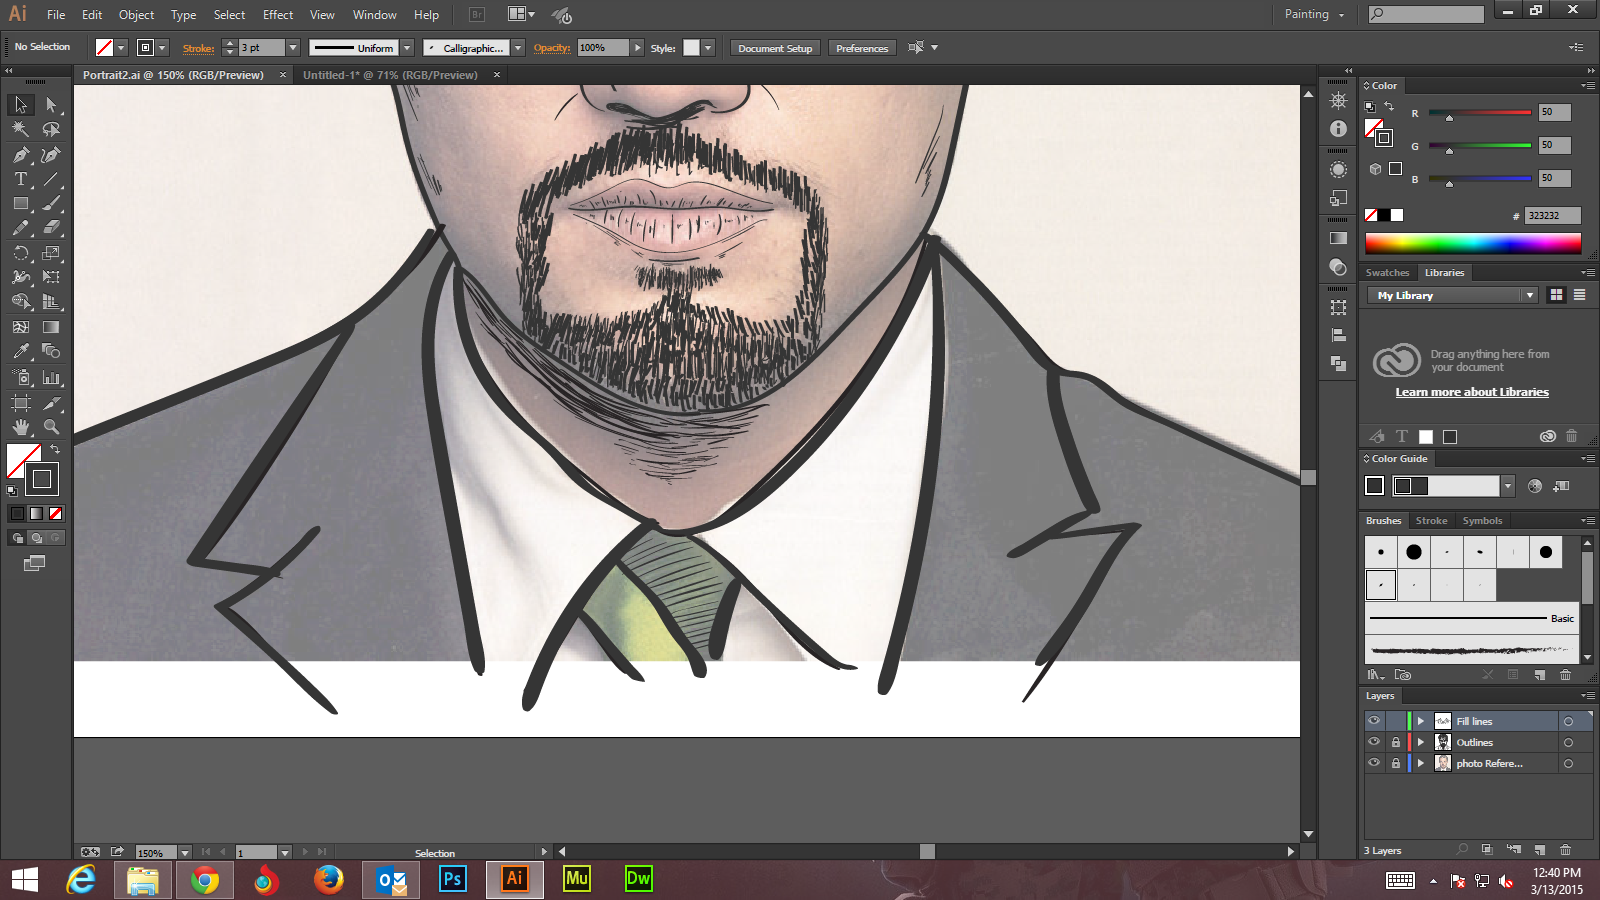 Design t shirt adobe illustrator tutorial - Step 10 Adobe Illustrator Tutorials